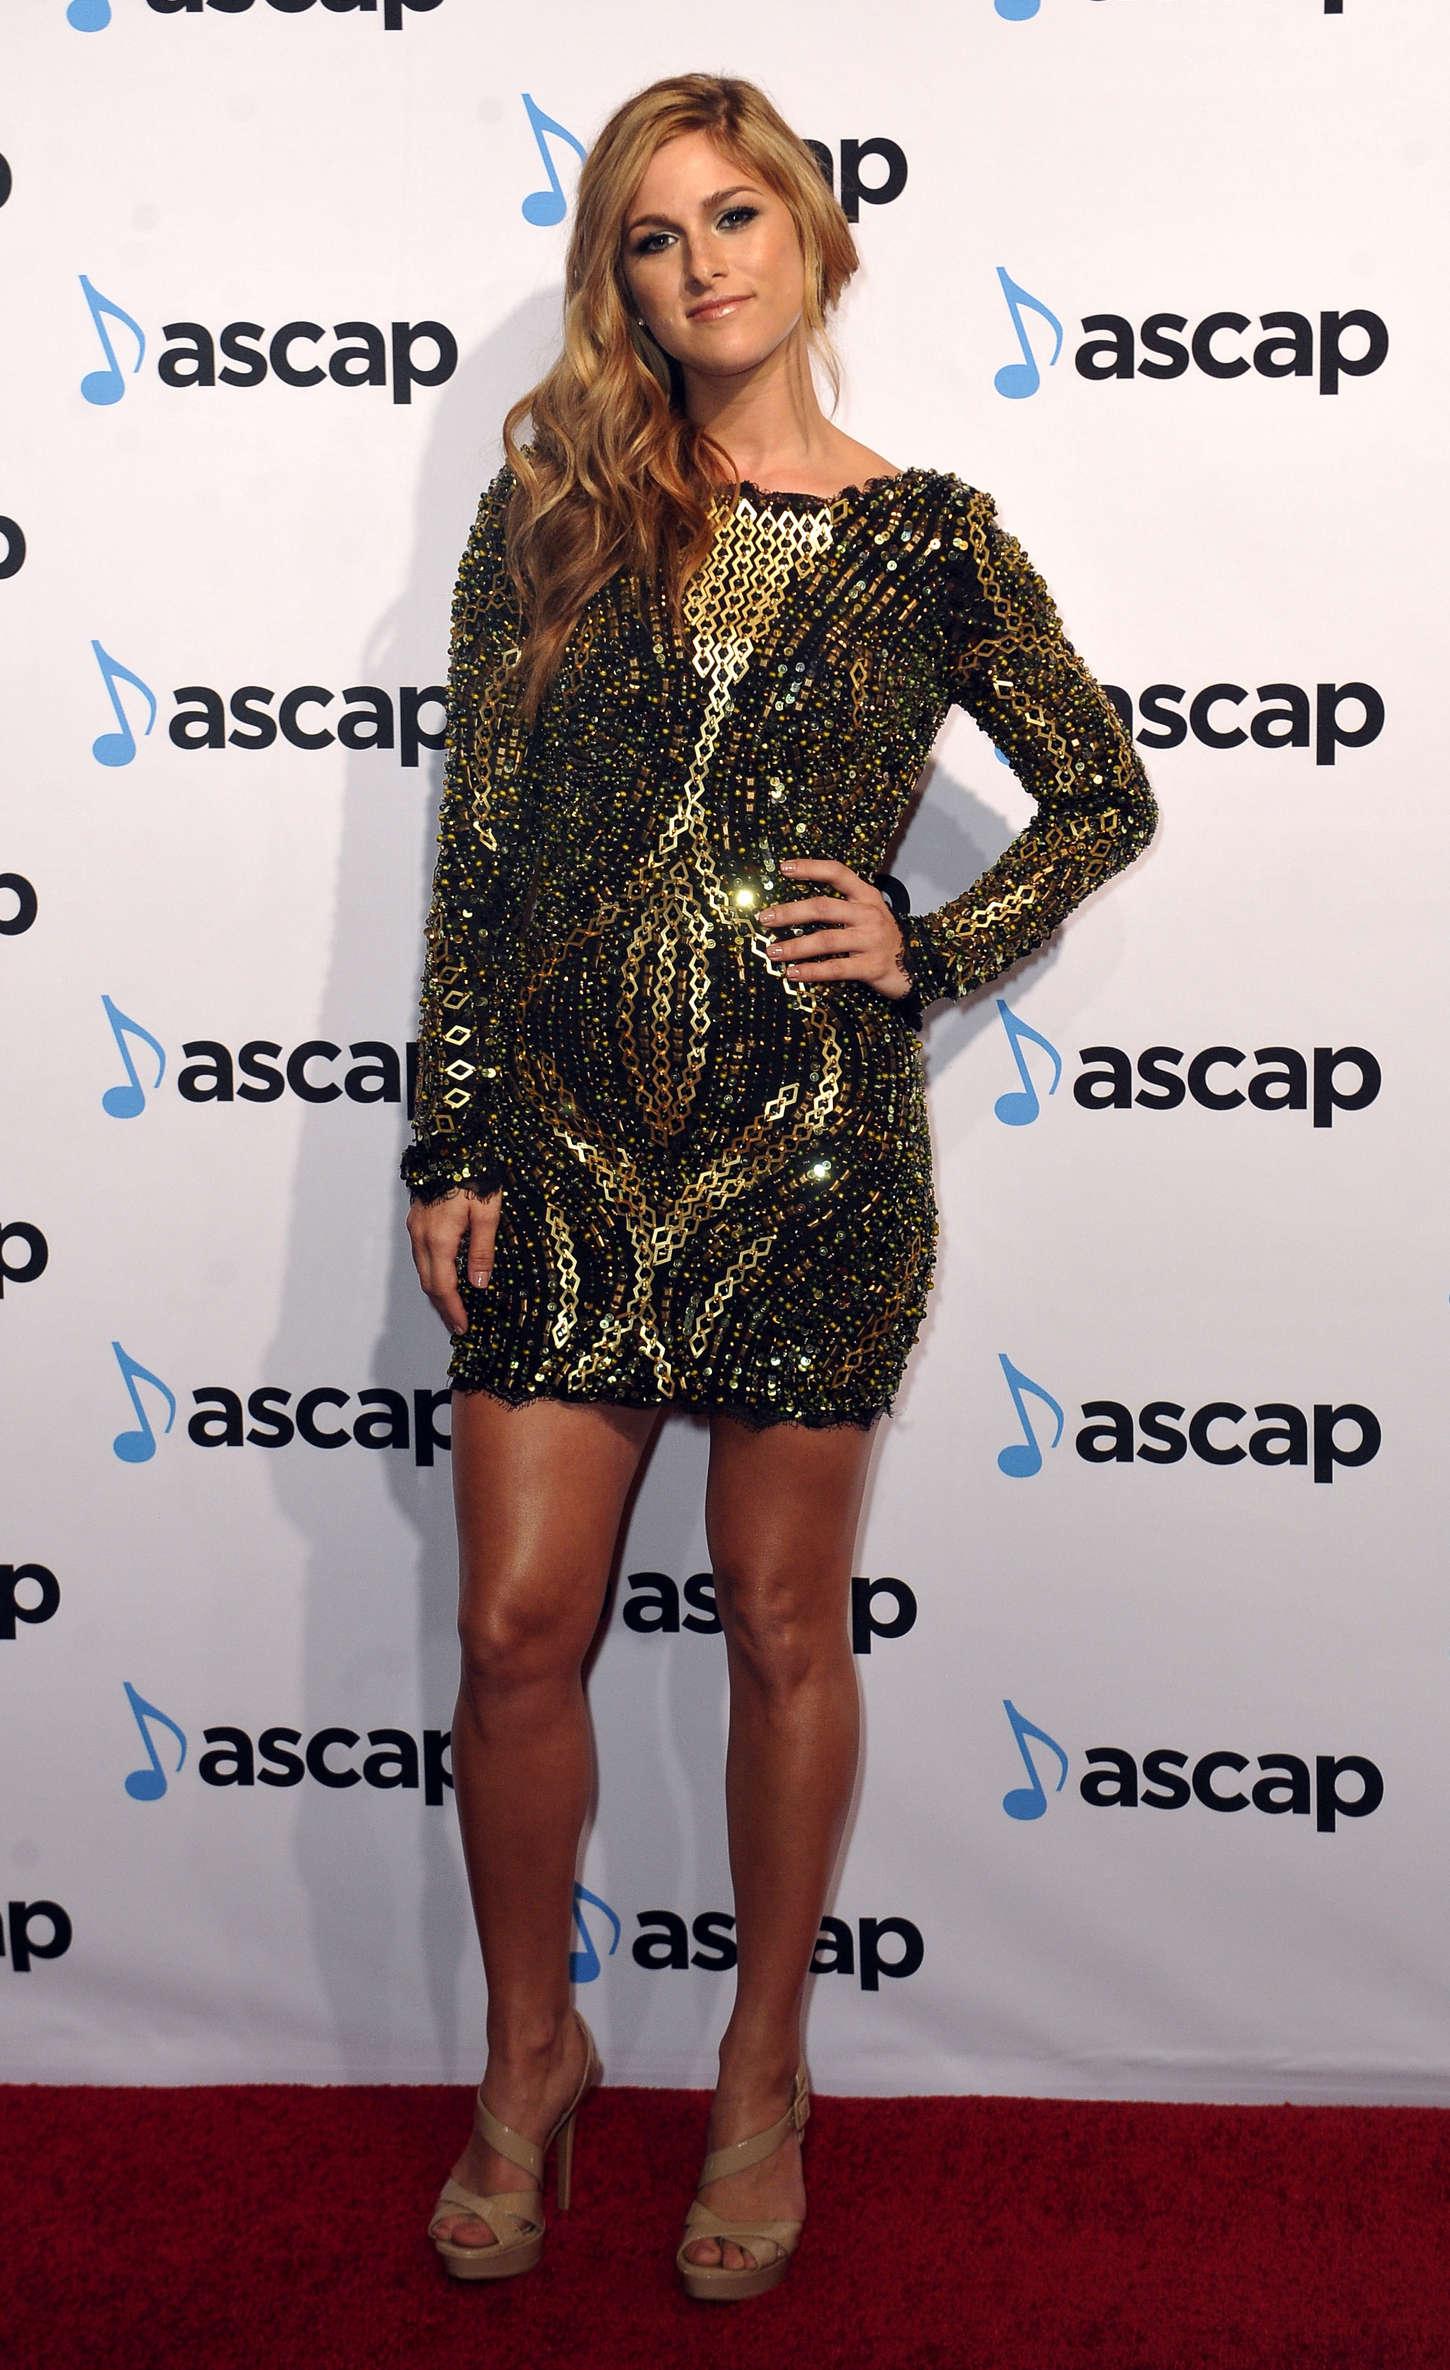 Cassadee Pope - 2015 ASCAP Country Music Awards in Nashville